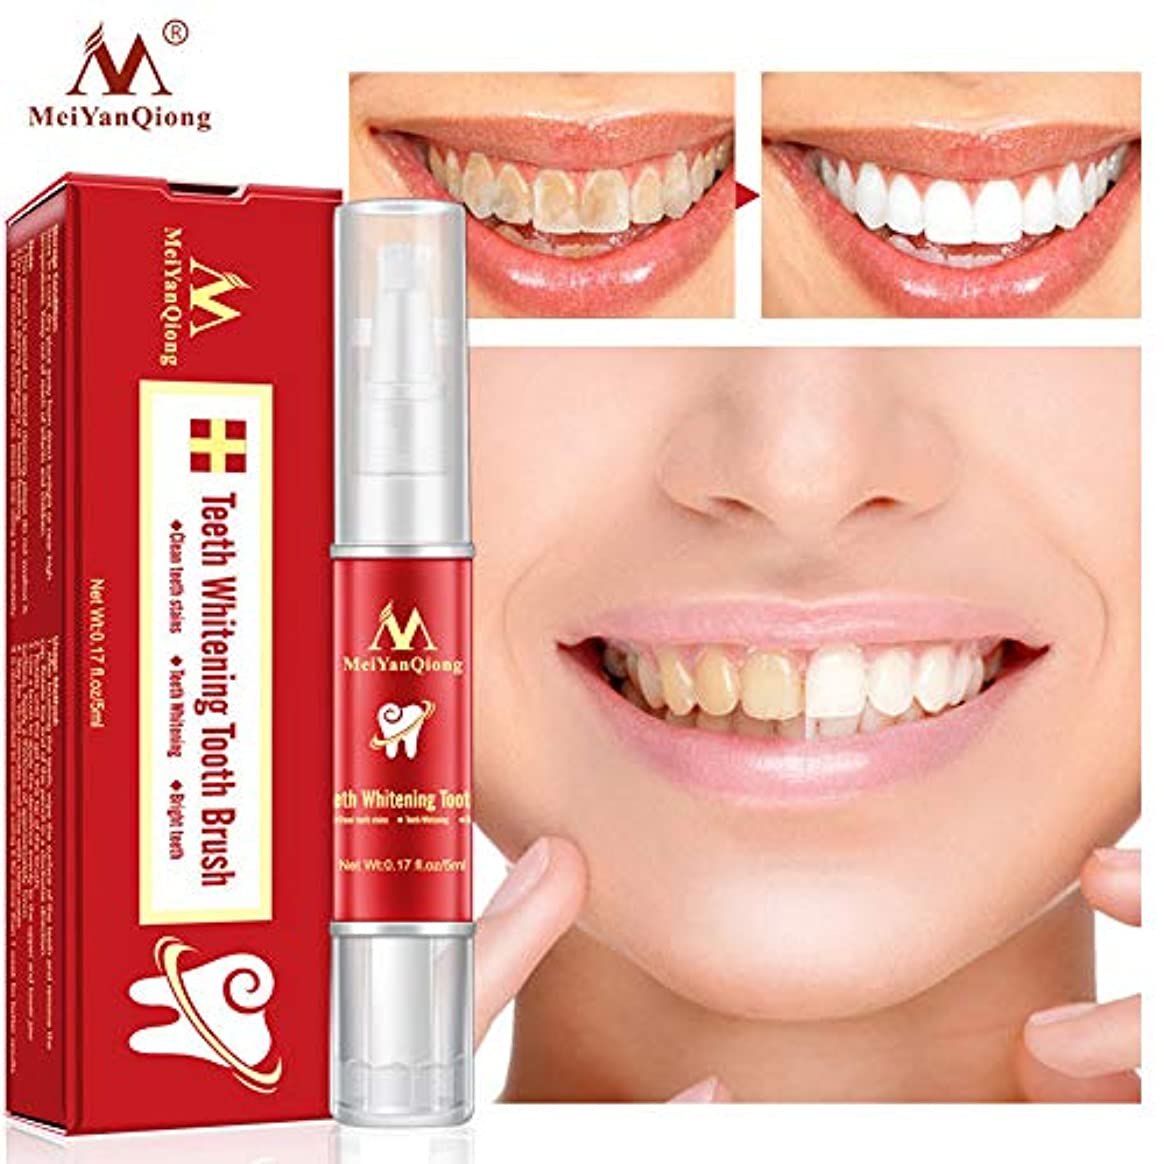 5ml 歯牙 美白ジェル 汚れ取り 黄ばみや歯垢落とし ばこのヤニ、ステイン除去 ホワイトニングジェル